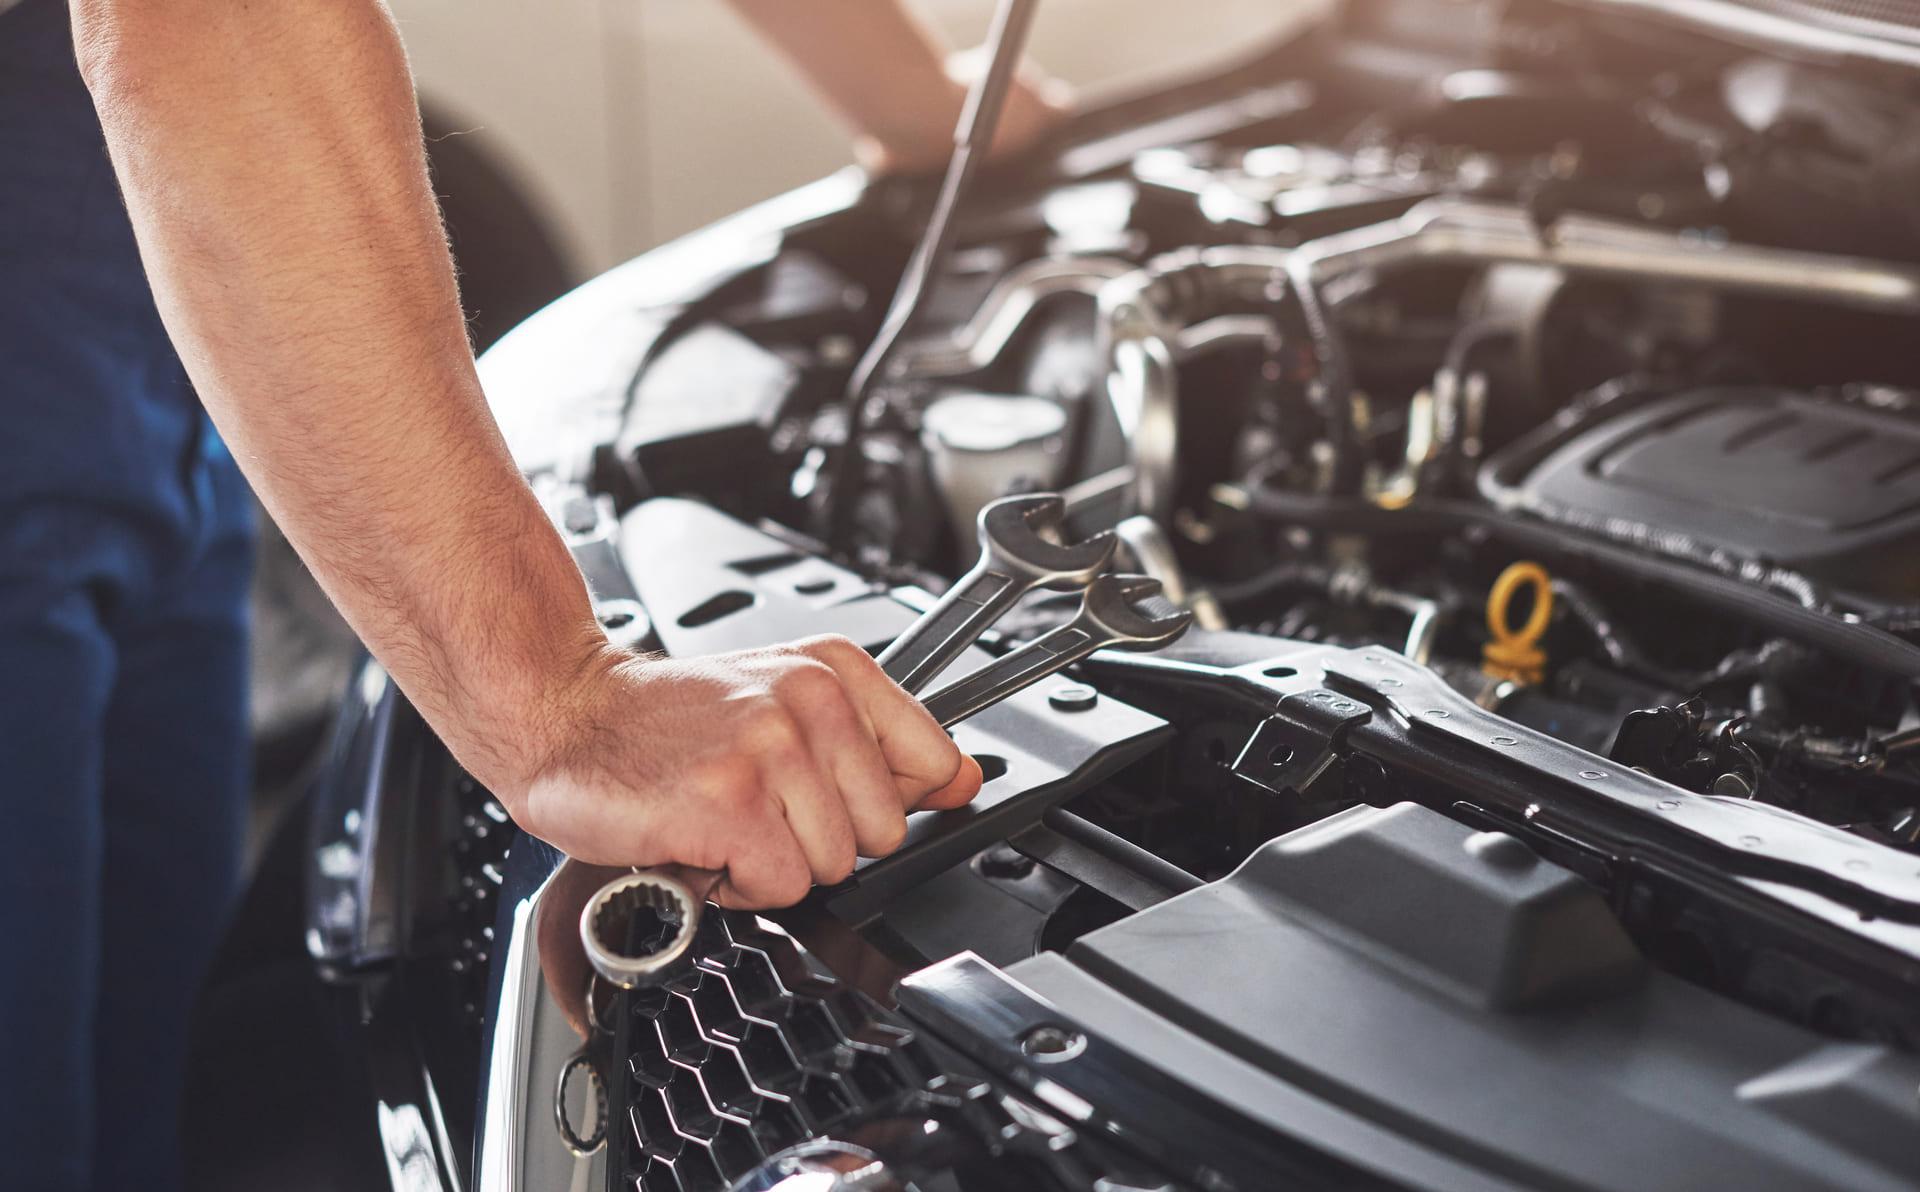 muscular car service worker repairing vehicle